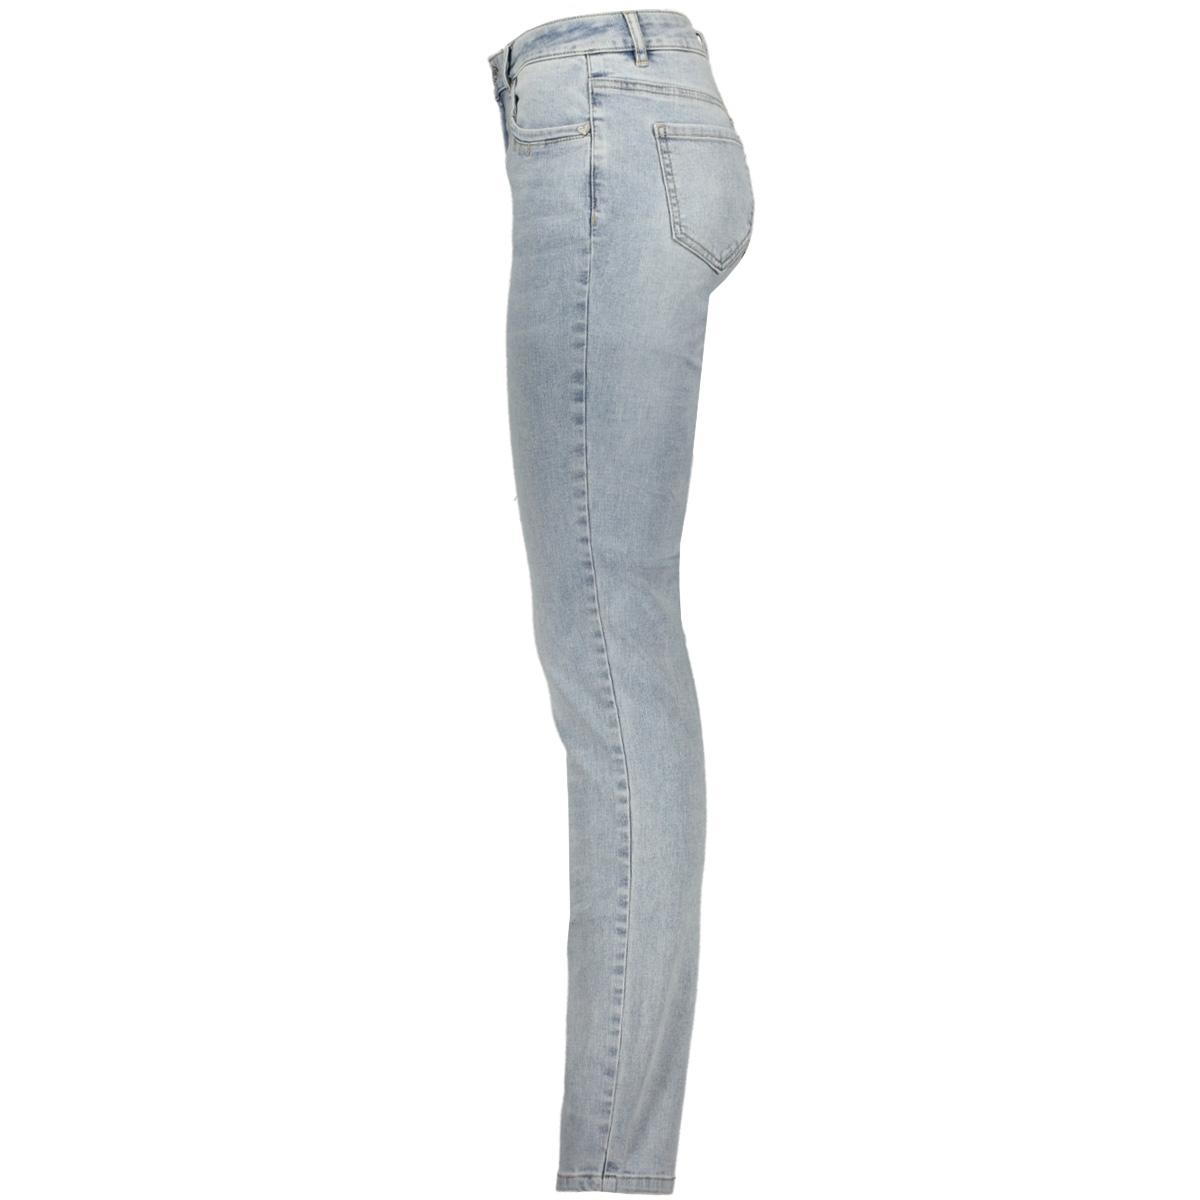 5 pocket jeans 0102210 geisha jeans bleached  denim